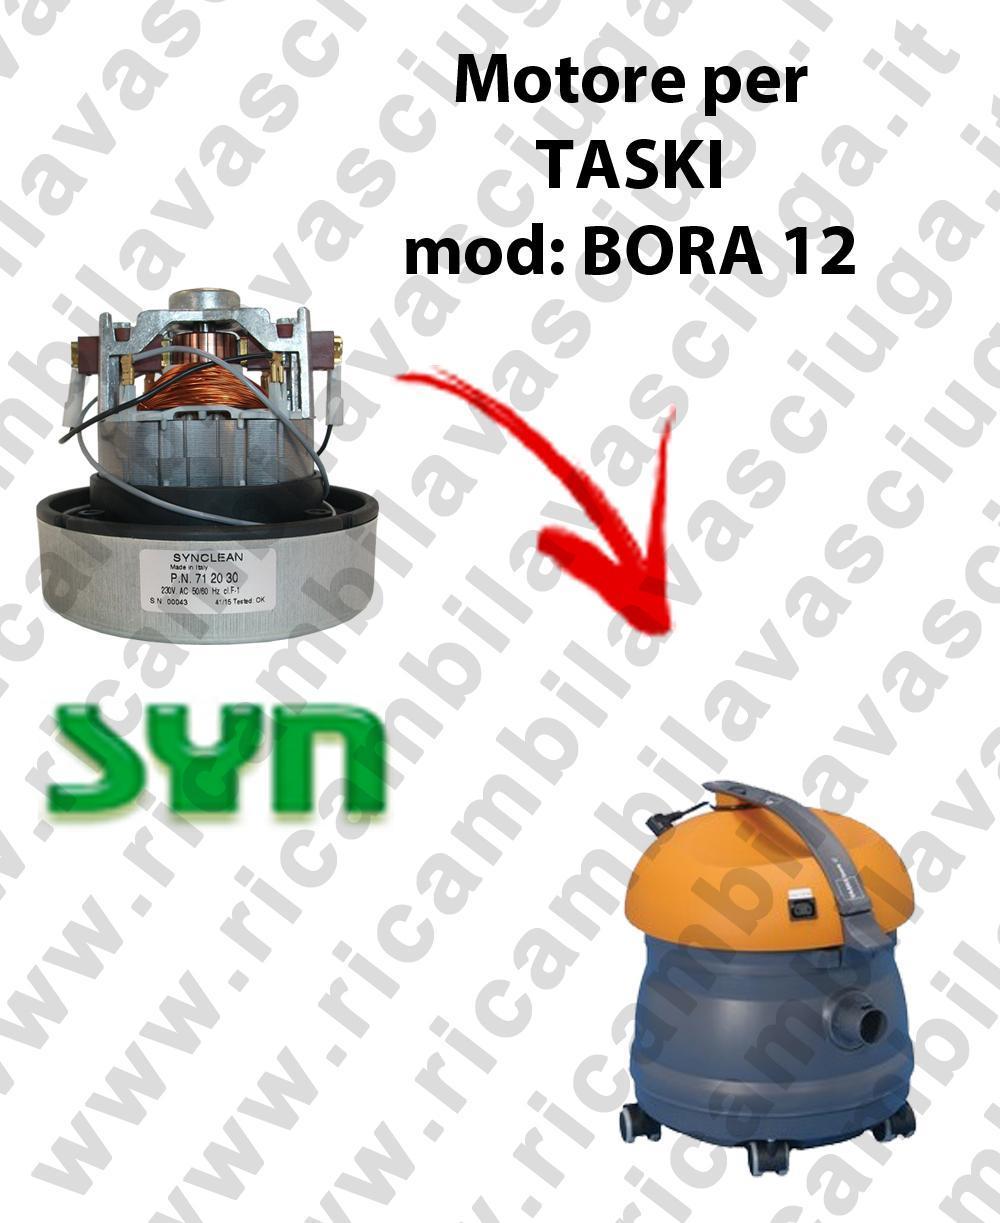 BORA 12 MOTEUR SYNCLEAN aspiration pour aspirateur TASKI